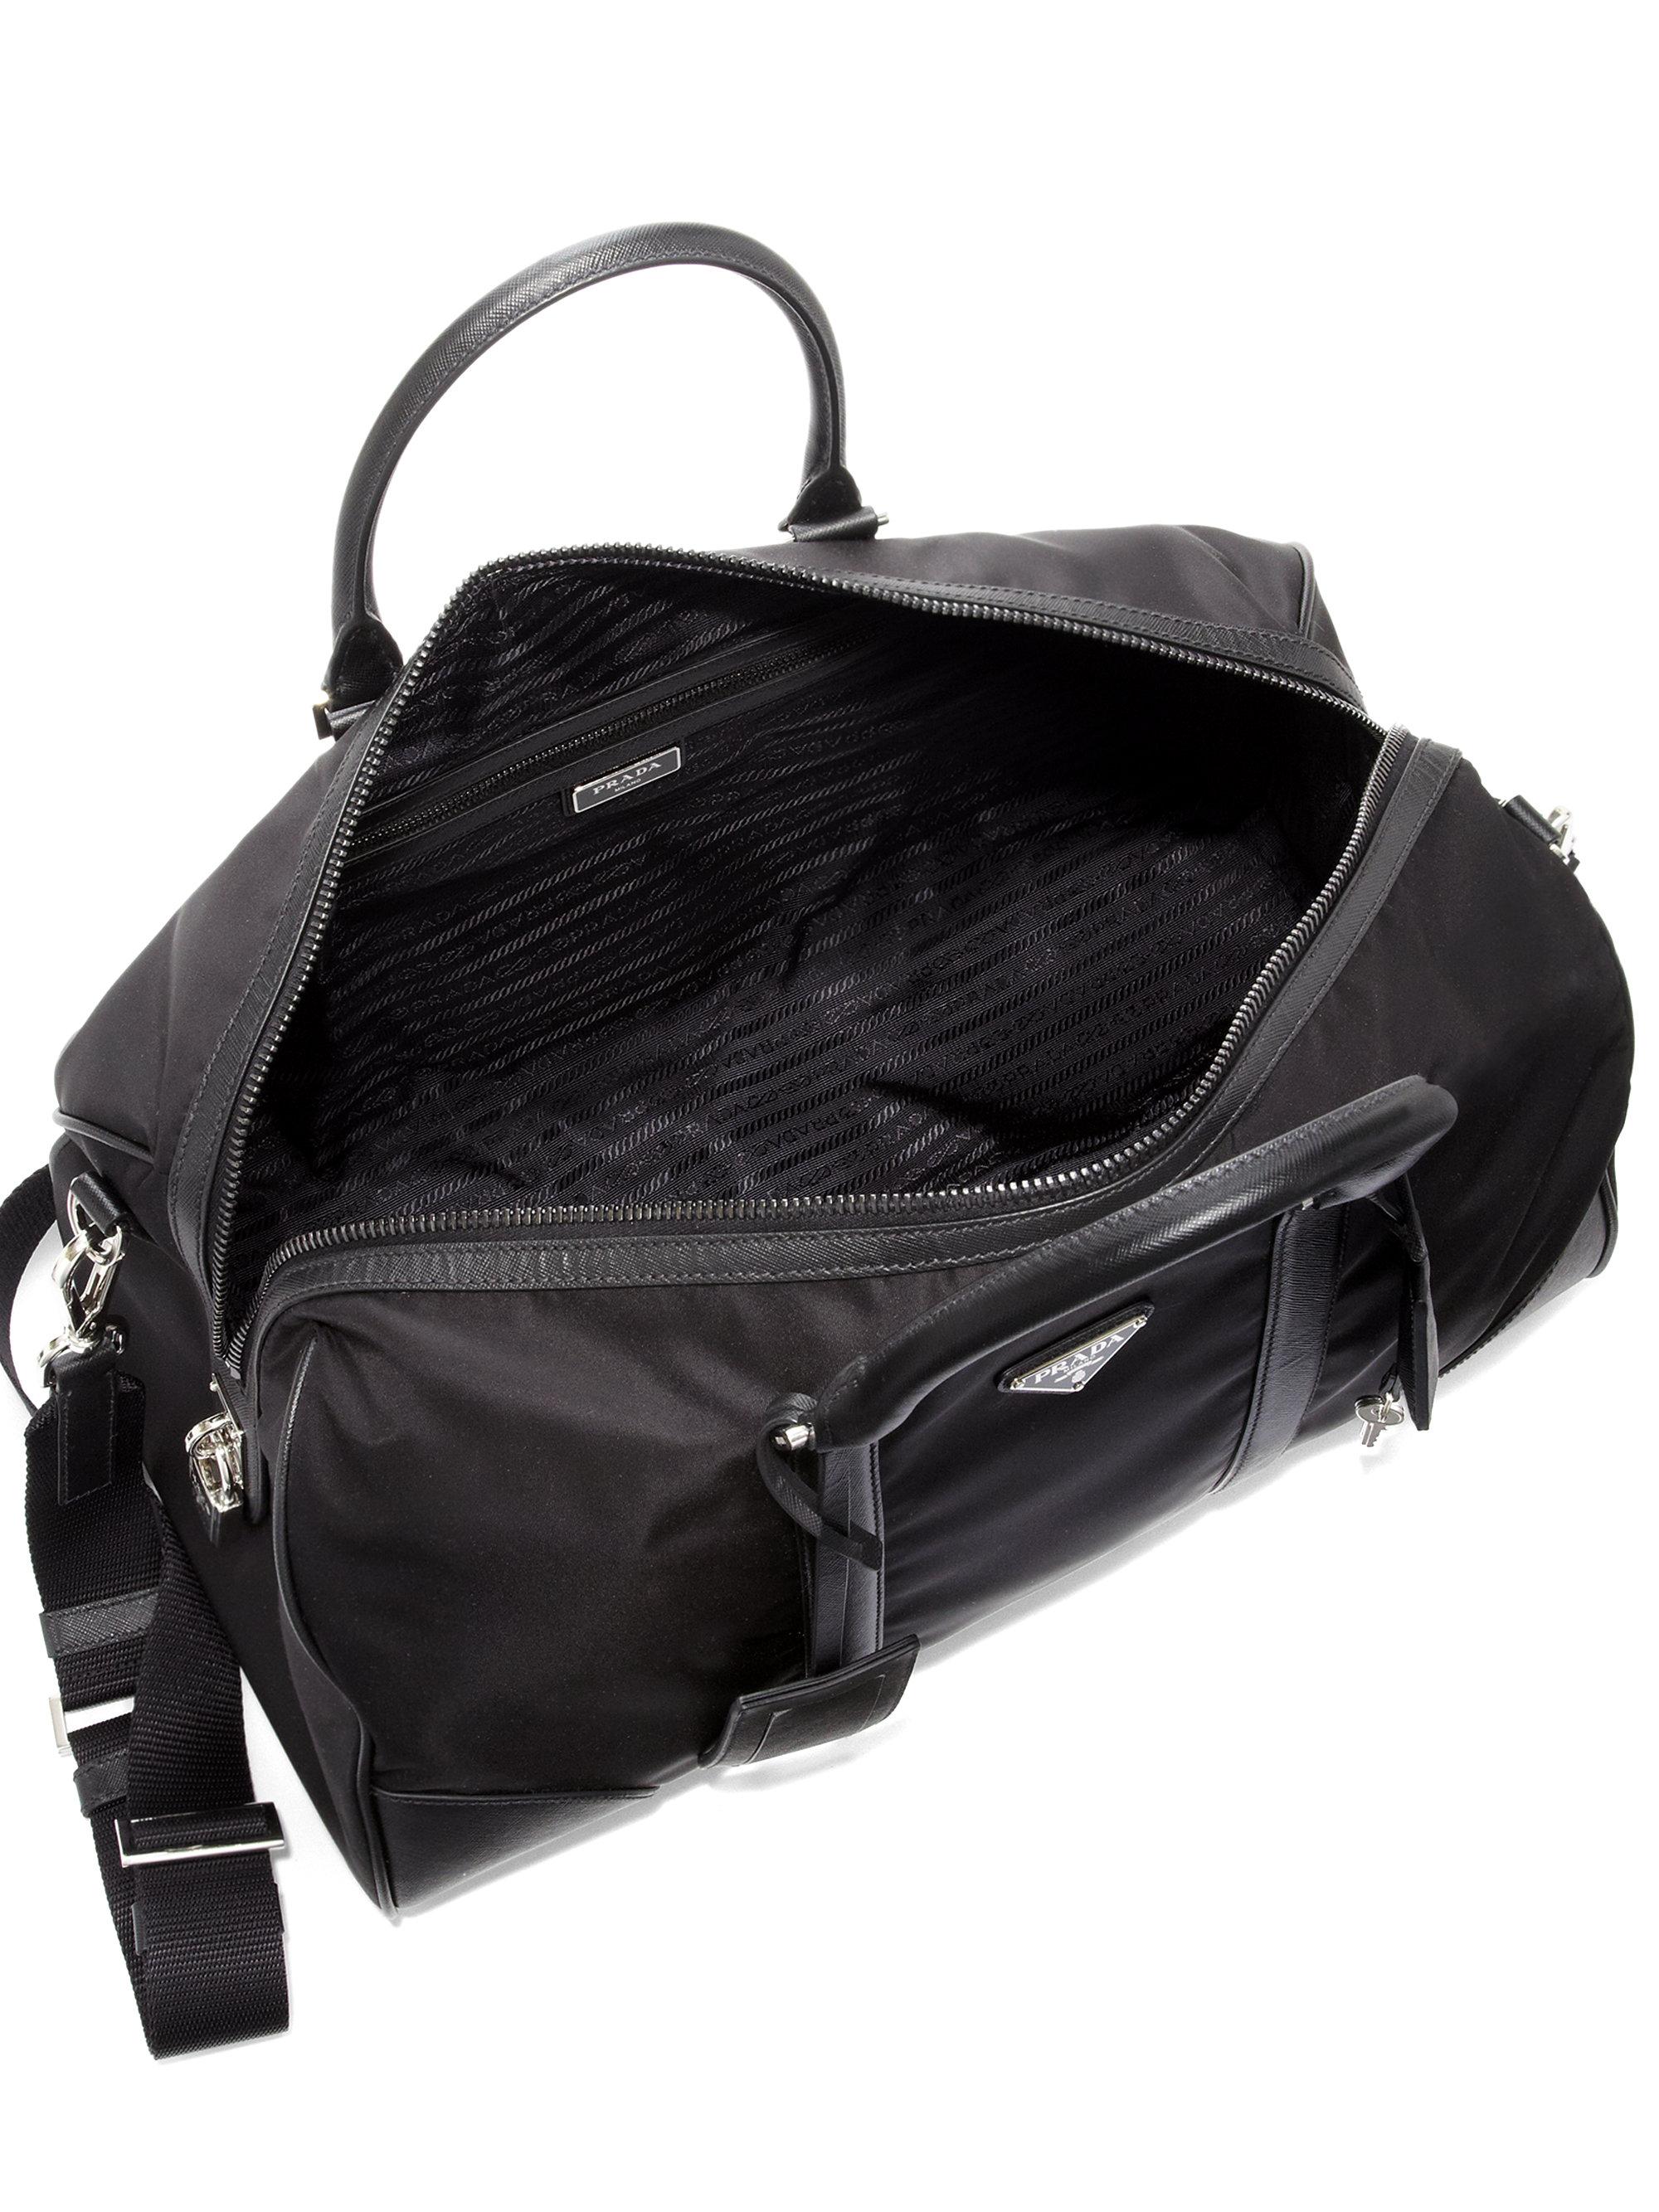 4fd1778c692aea ... denmark lyst prada nylon saffiano leather duffel bag in black for men  be63b 0c026